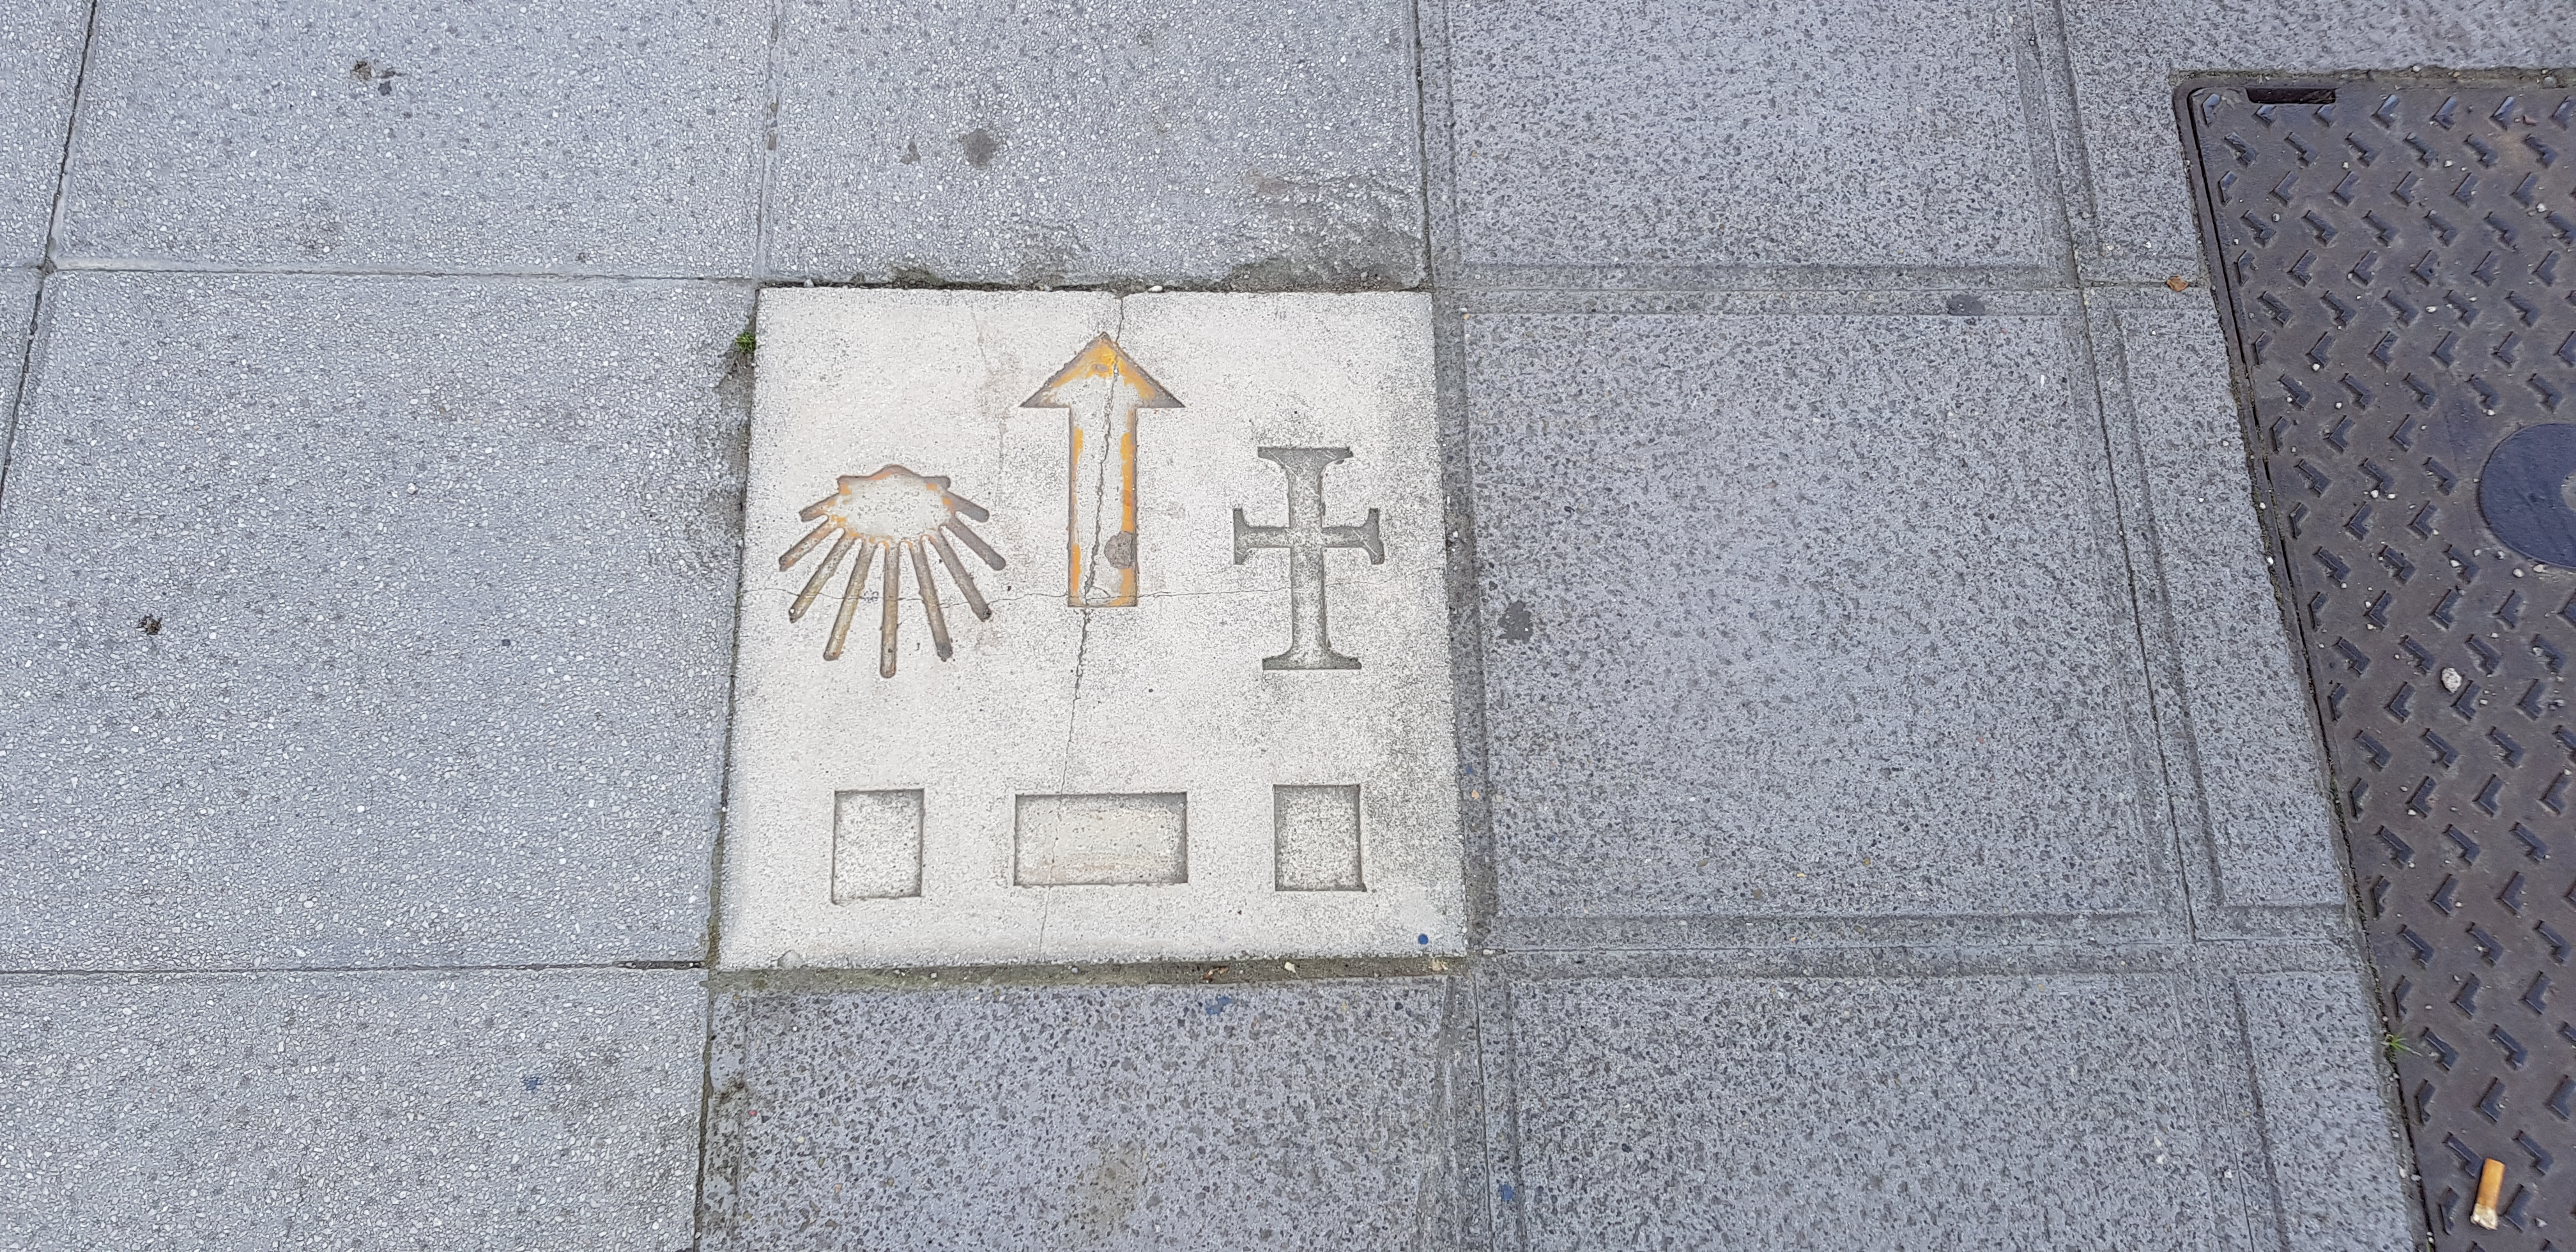 In Santander ist der Camino häufig so markiert